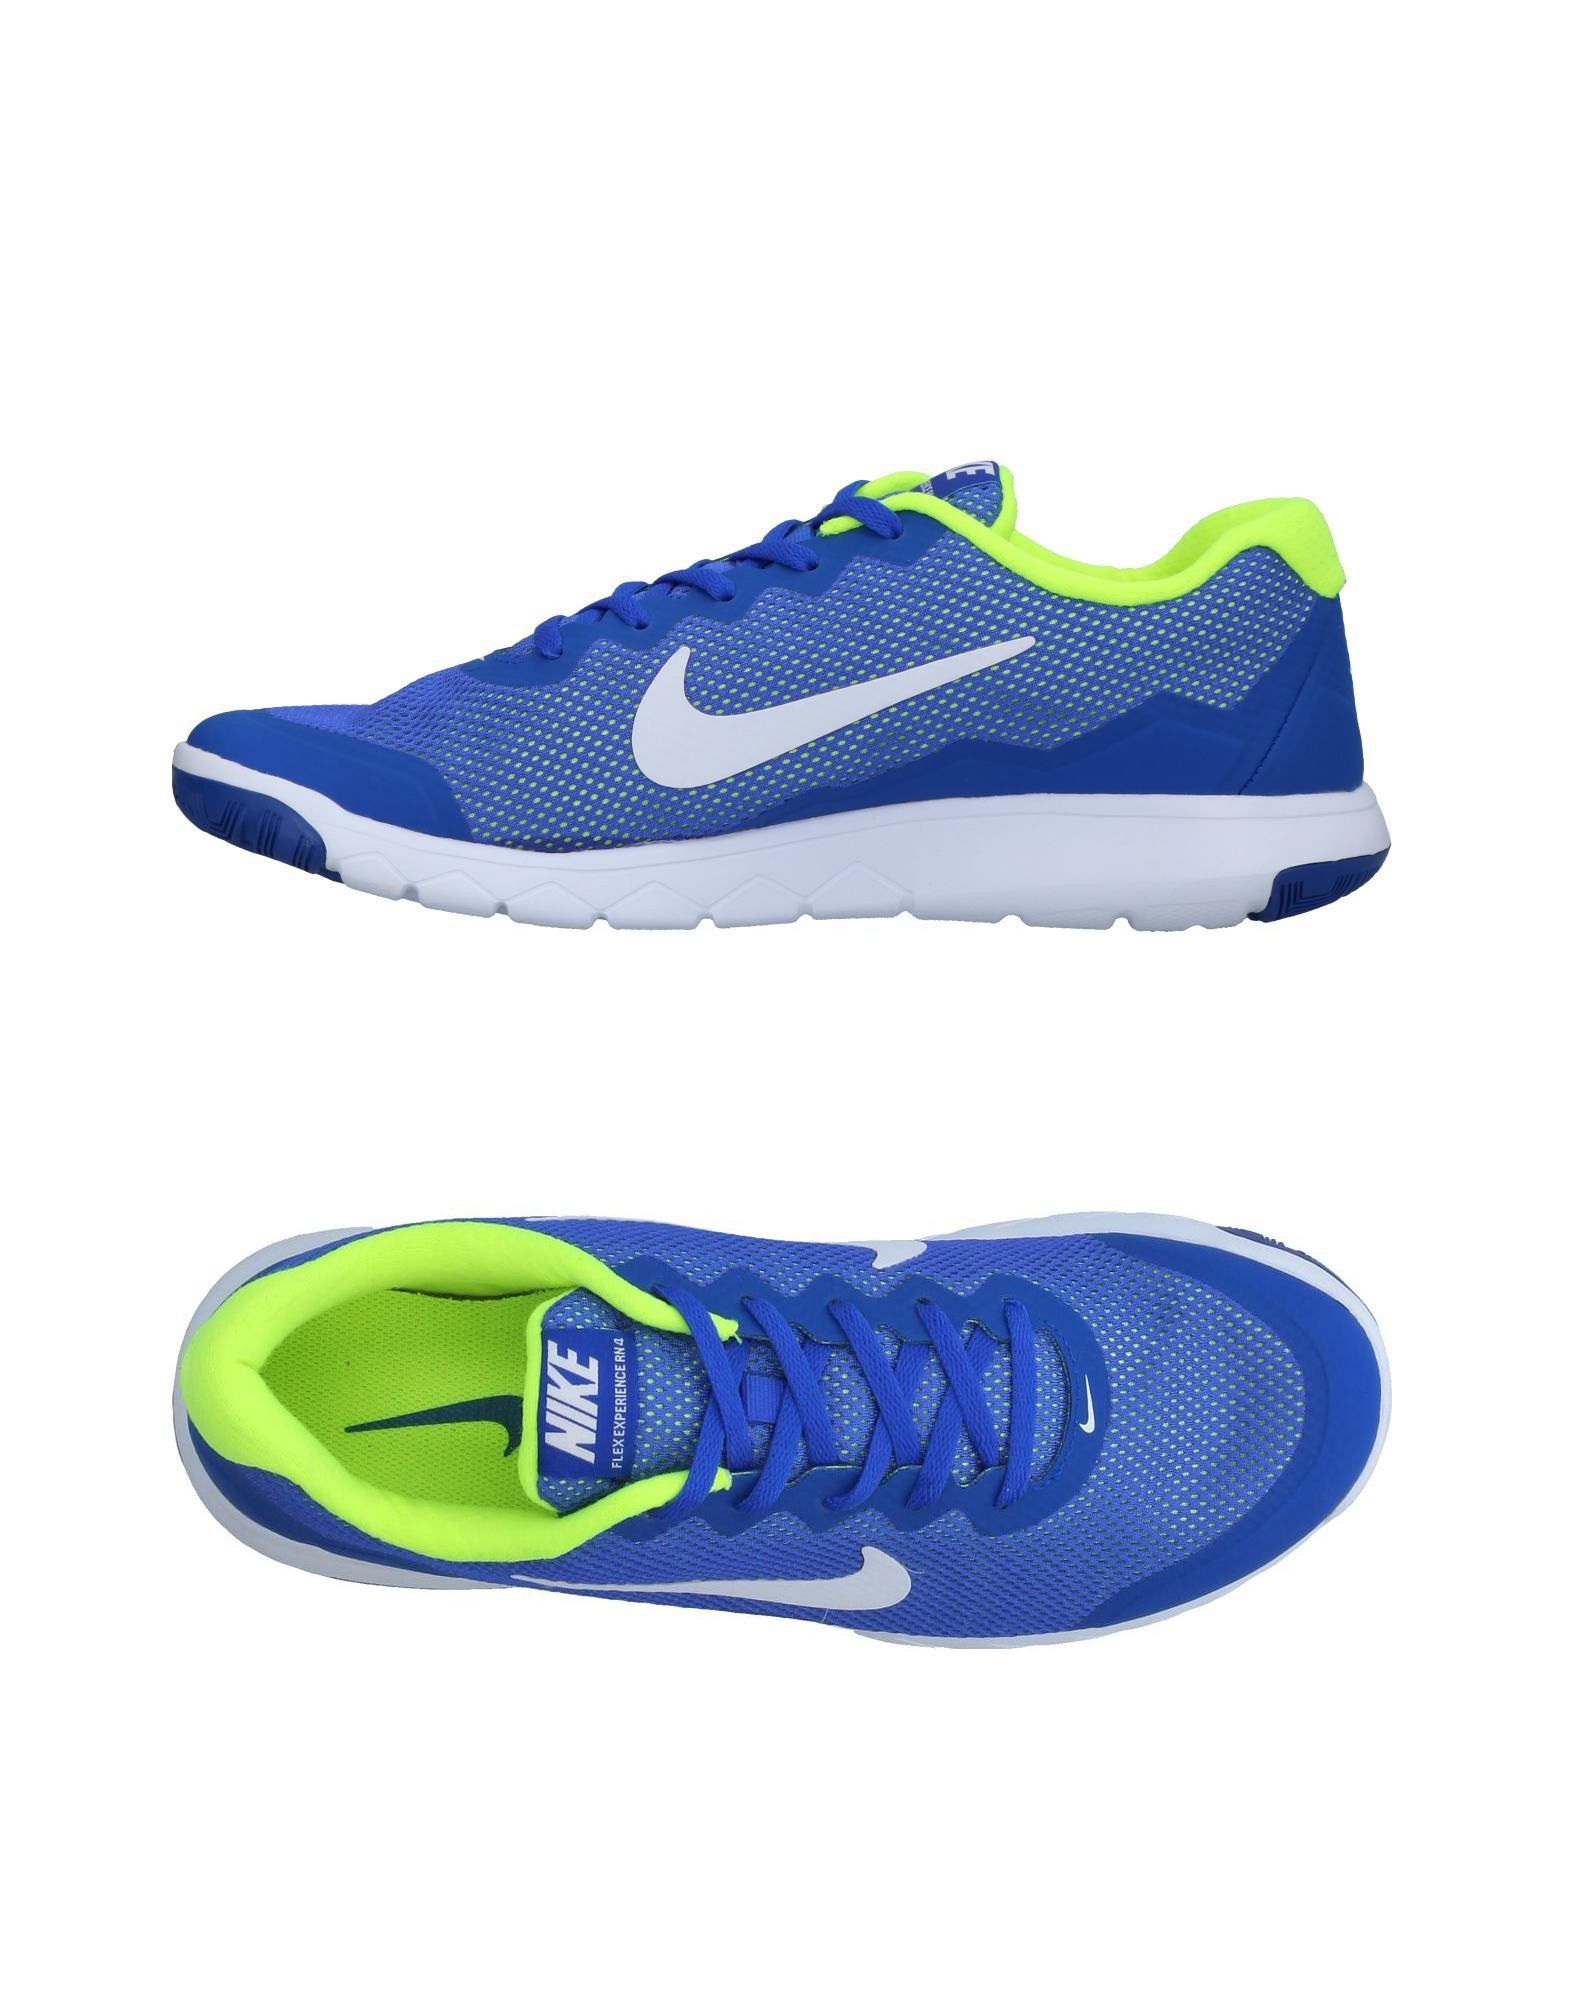 Sneakers Nike Uomo - 11396416GW elegante